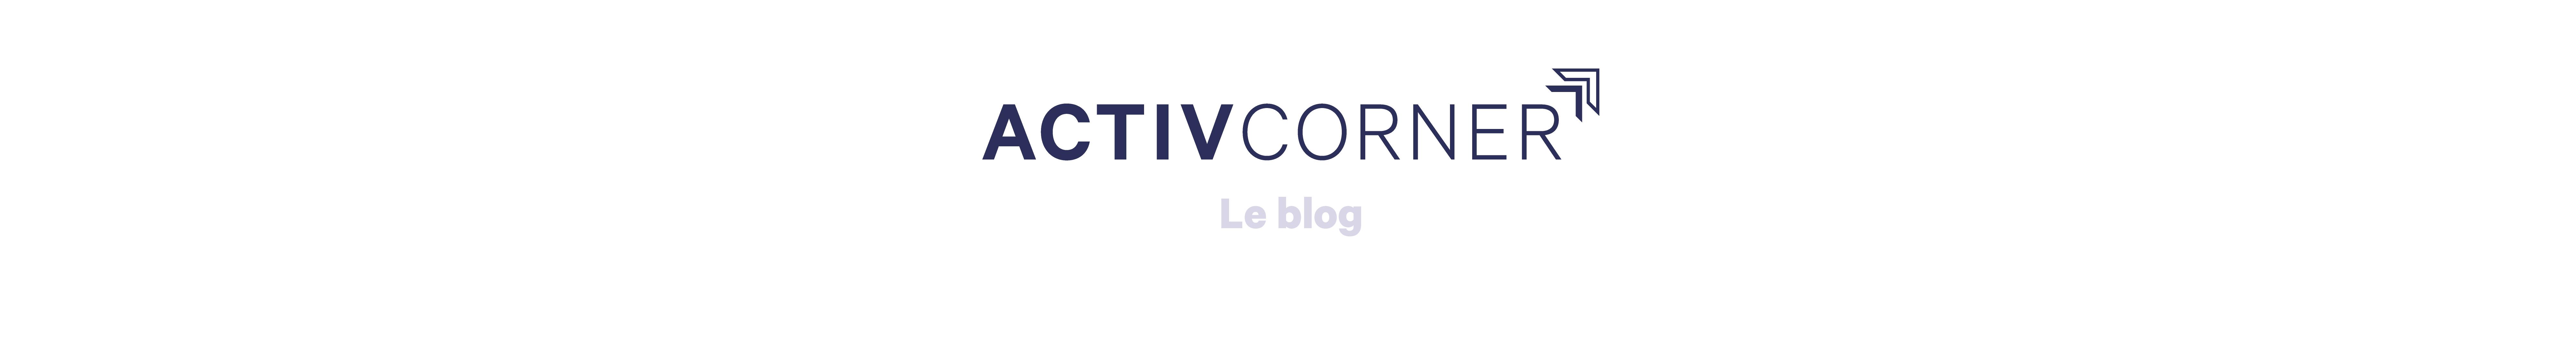 ActivCorner le Blog